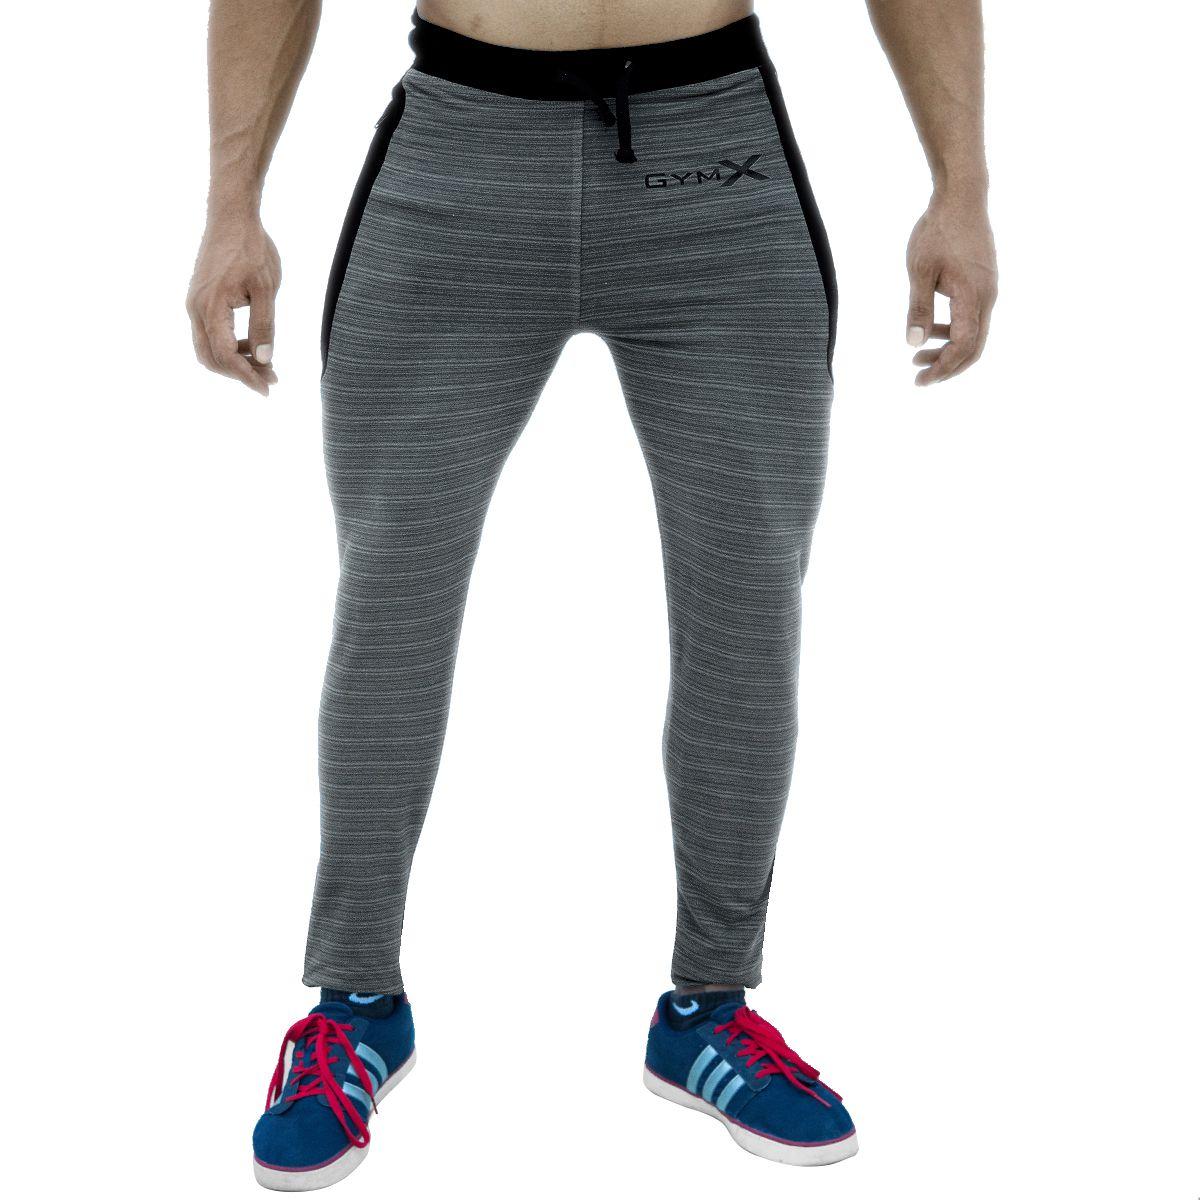 GymX Mens Legacy Sweatpants- Strike Shark Grey